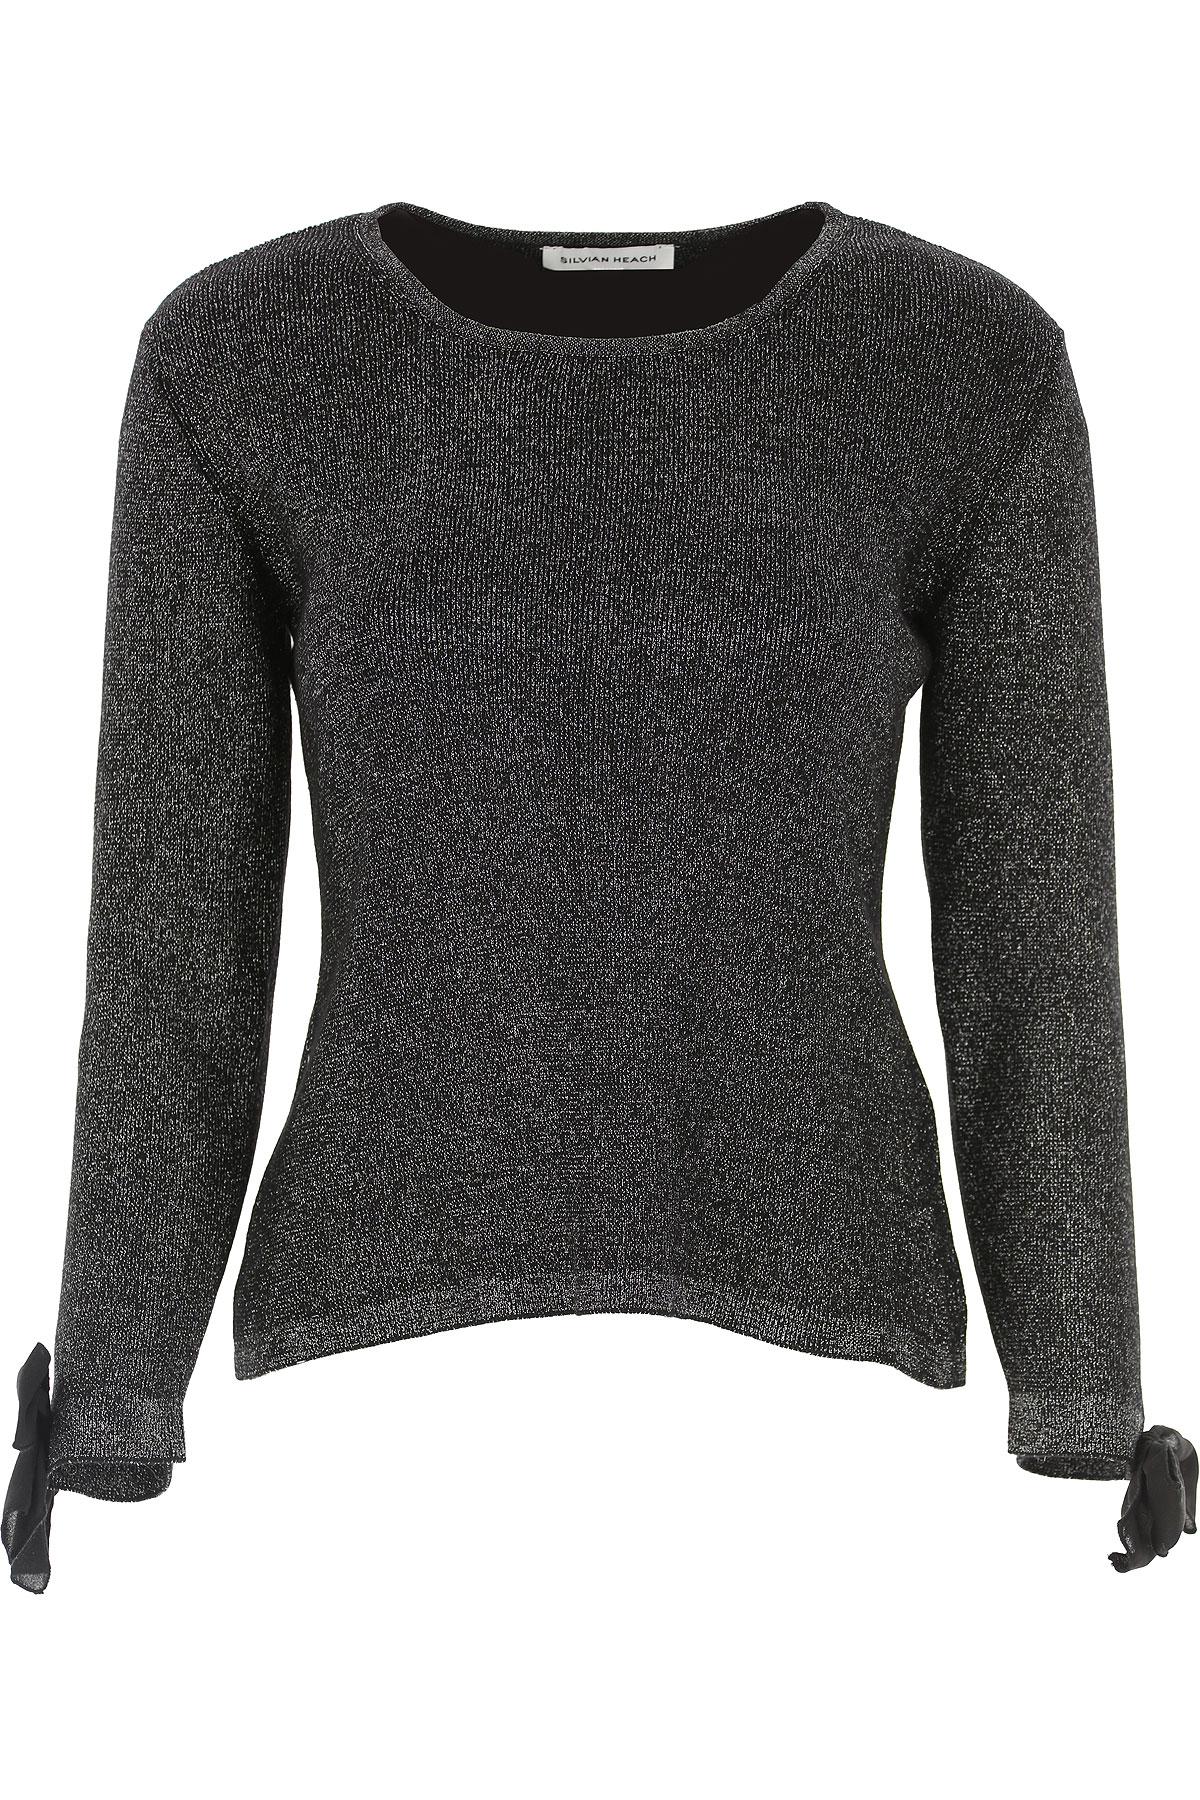 Silvian Heach Sweater for Women Jumper On Sale, Black, Cotton, 2019, 4 8